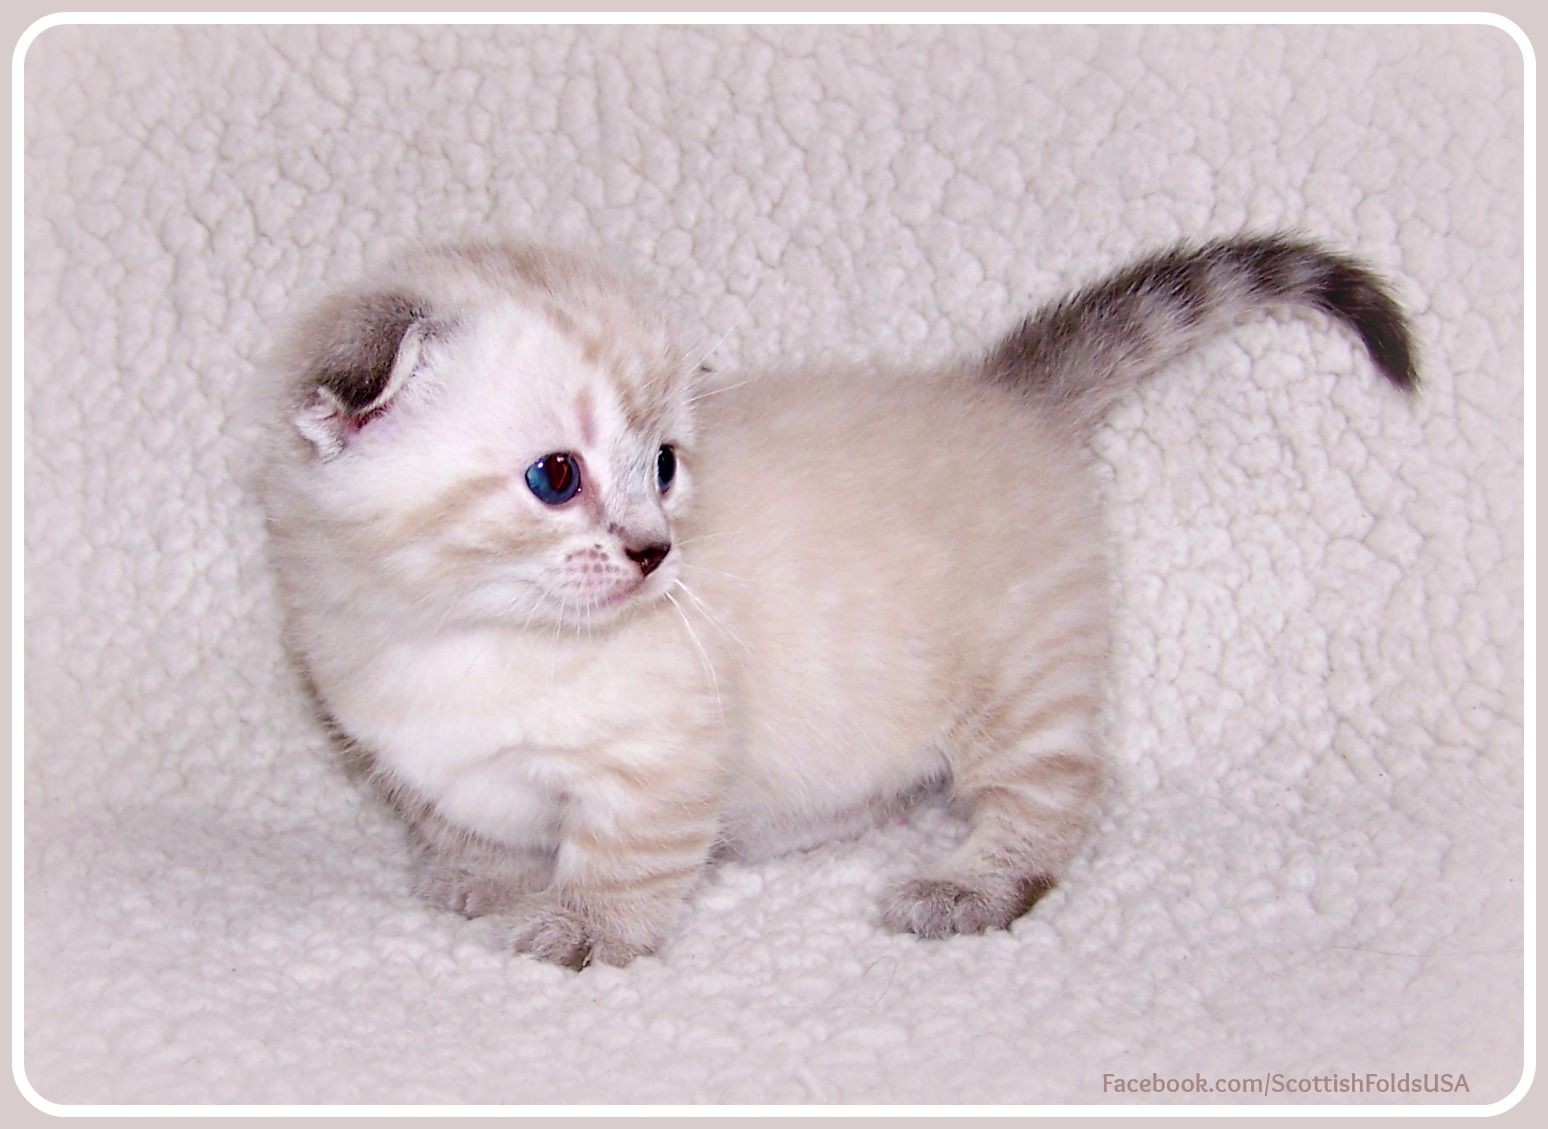 Sottish Fold Munchkin Cat Scottish Kilt Cat Lovingfolds Melt My Heart 4 Week Old Rare Standar Munchkin Cat Scottish Fold Kittens Munchkin Cat Scottish Fold